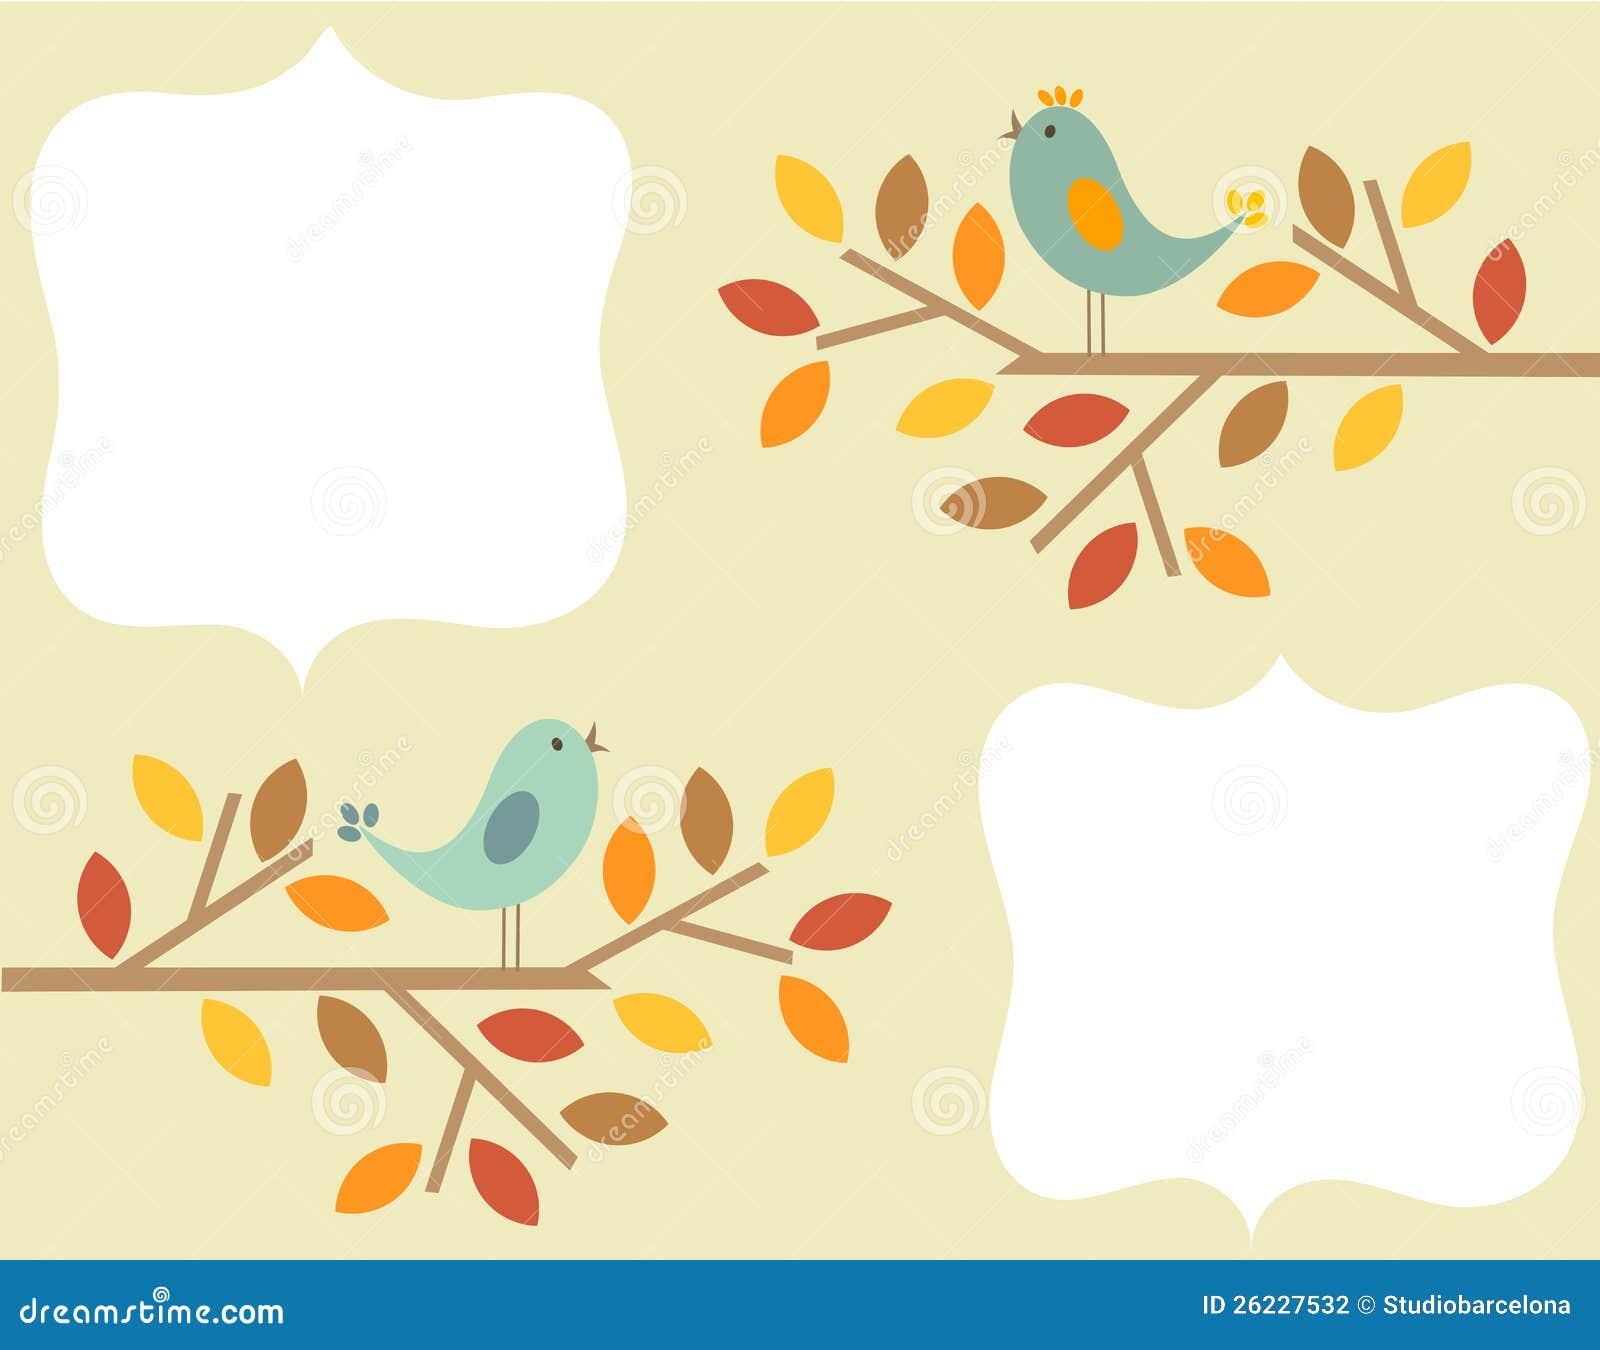 Рамки для текста картинки улетающих птиц осенью